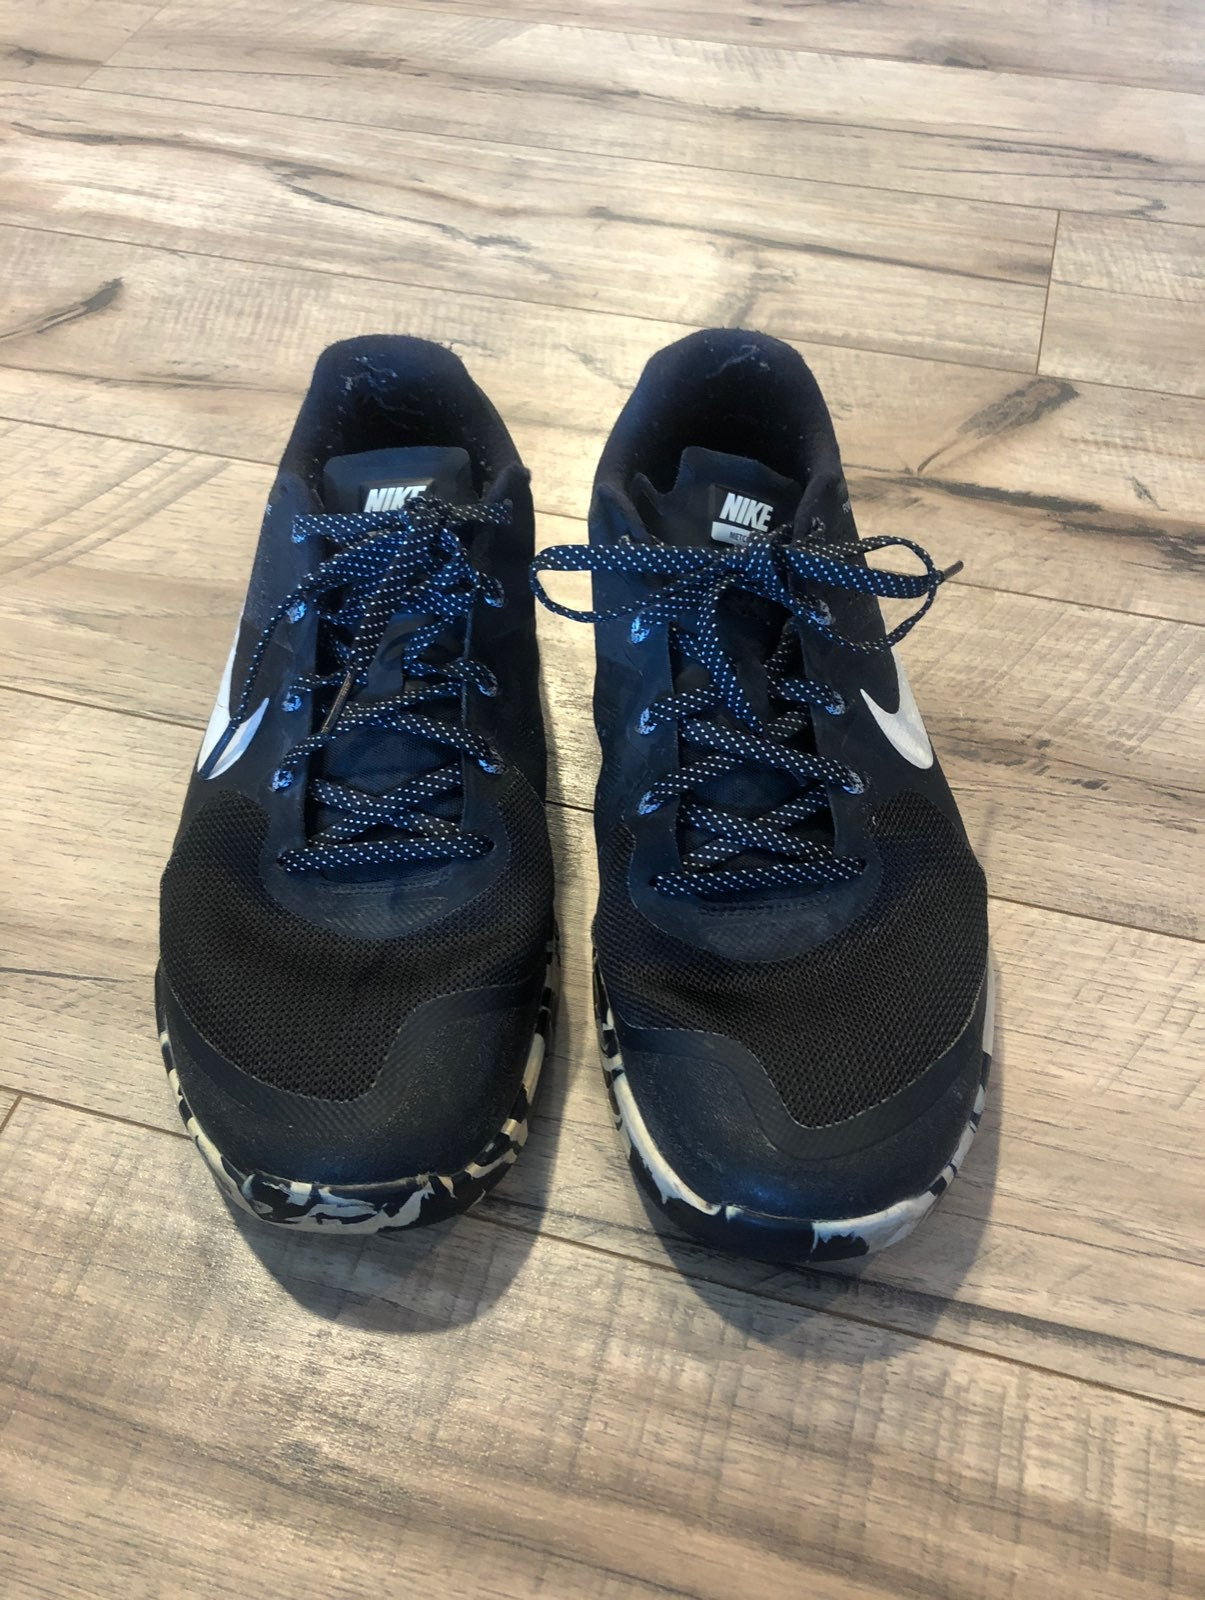 Mens nike metcon shoes